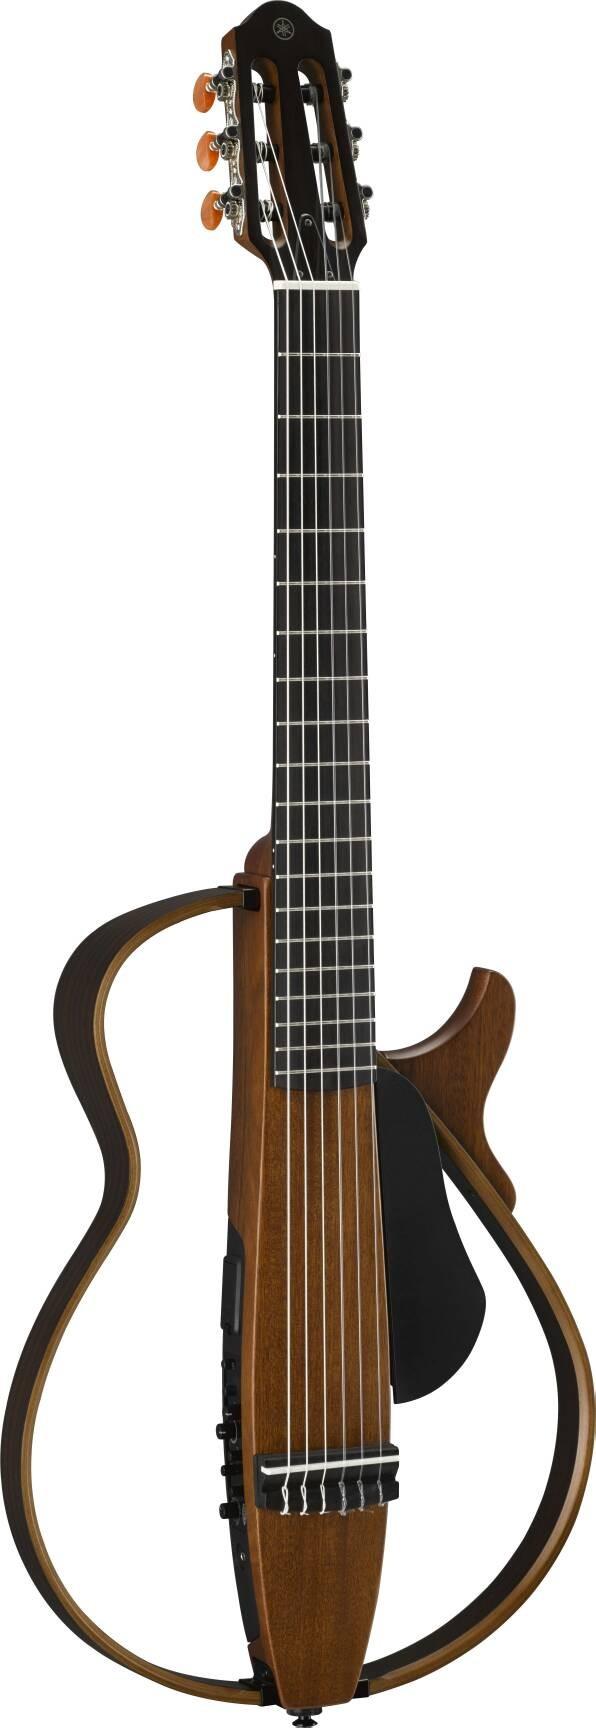 Jual Yamaha Gitar Silent SLG200N SLG200 SLG 200 N 200N Jakarta Barat Irama Music Store